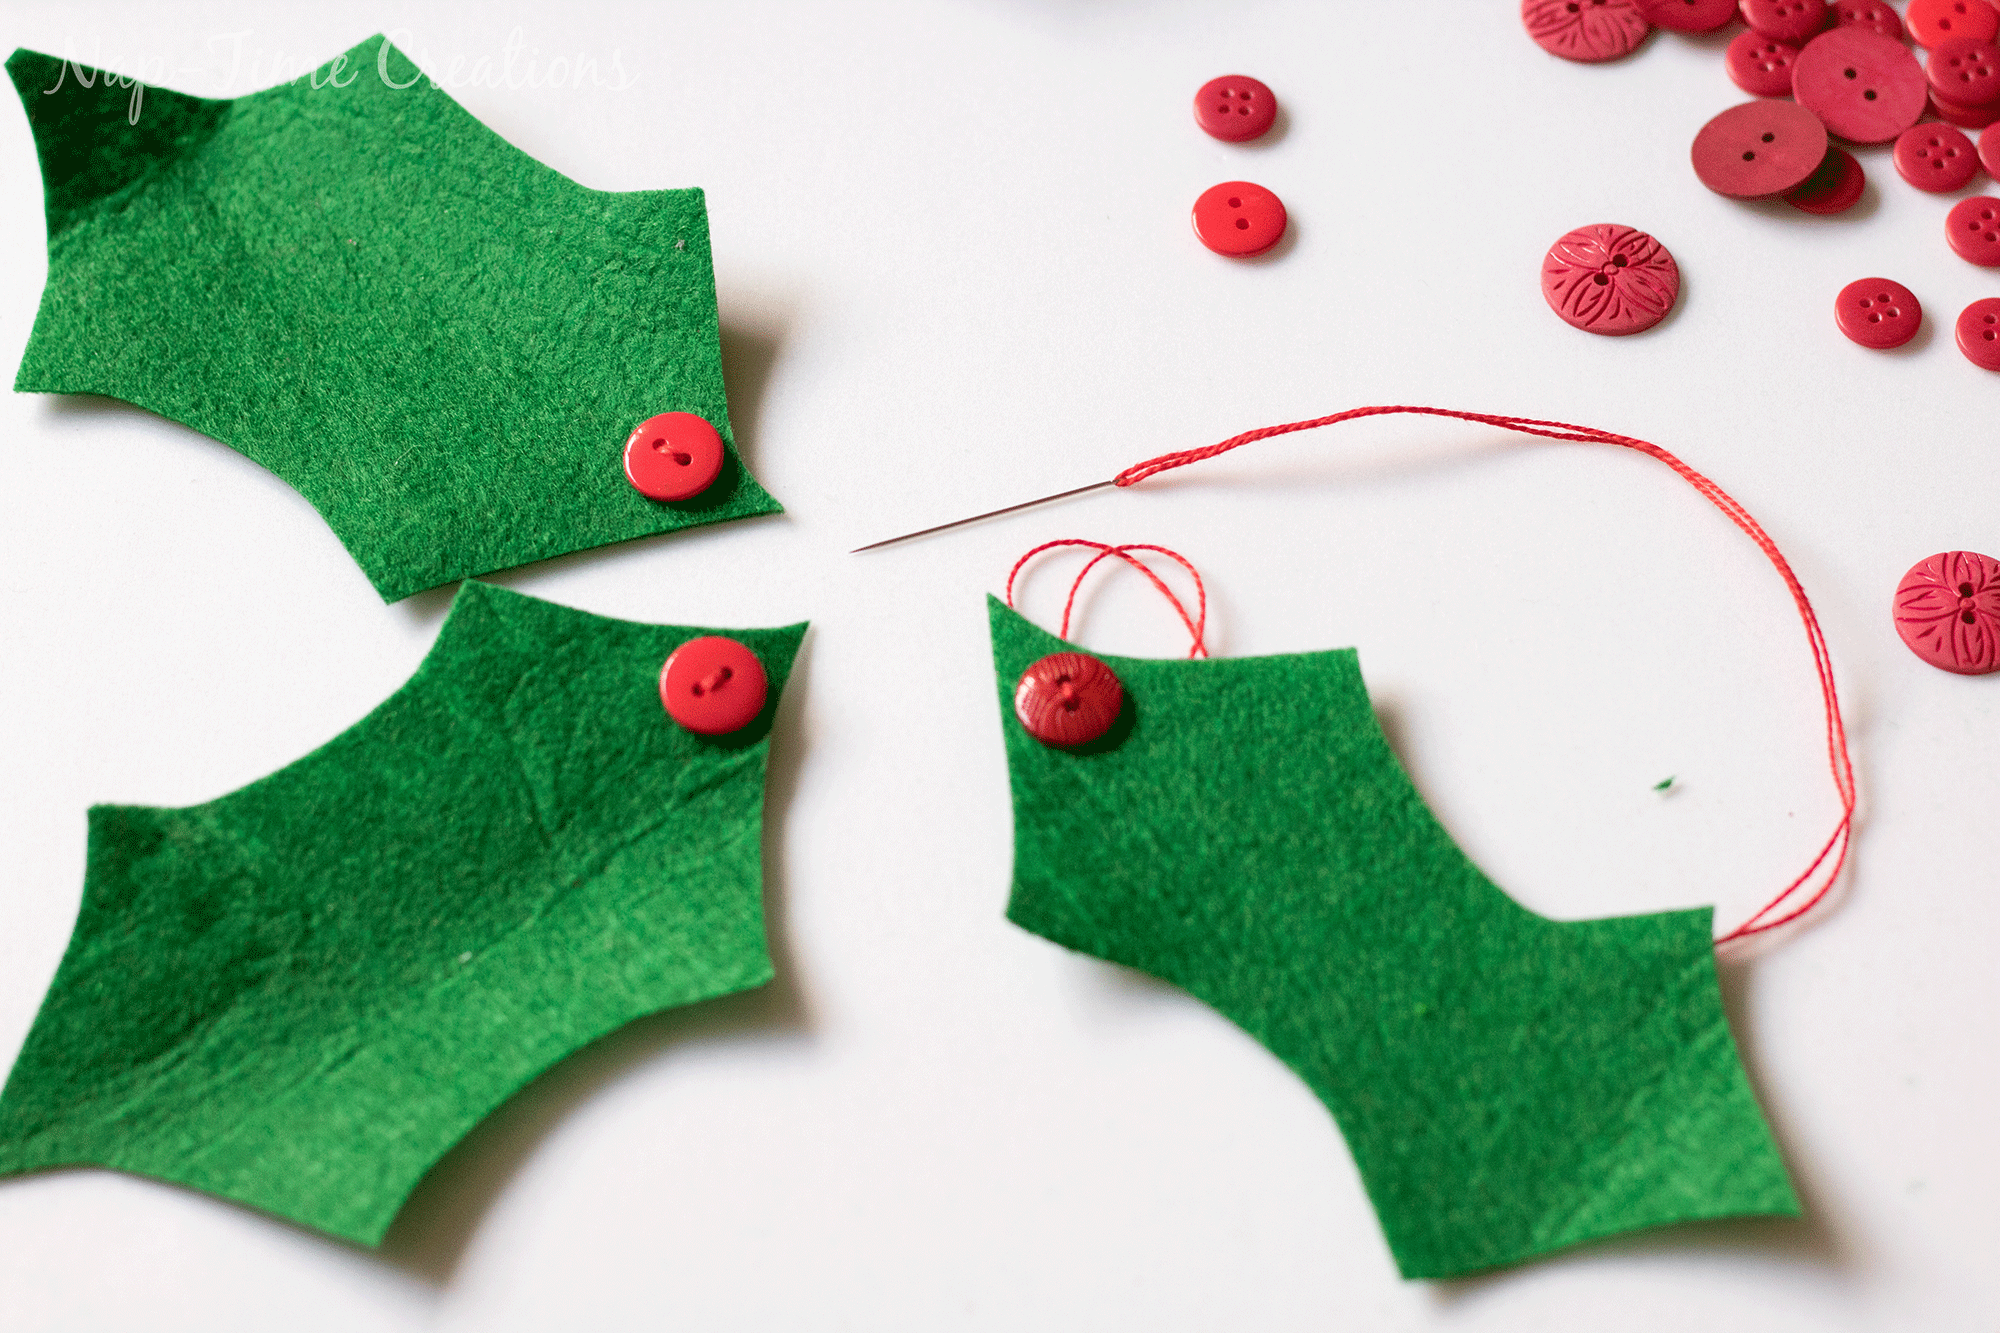 holly-jolly-christmas-countown-calendar-16